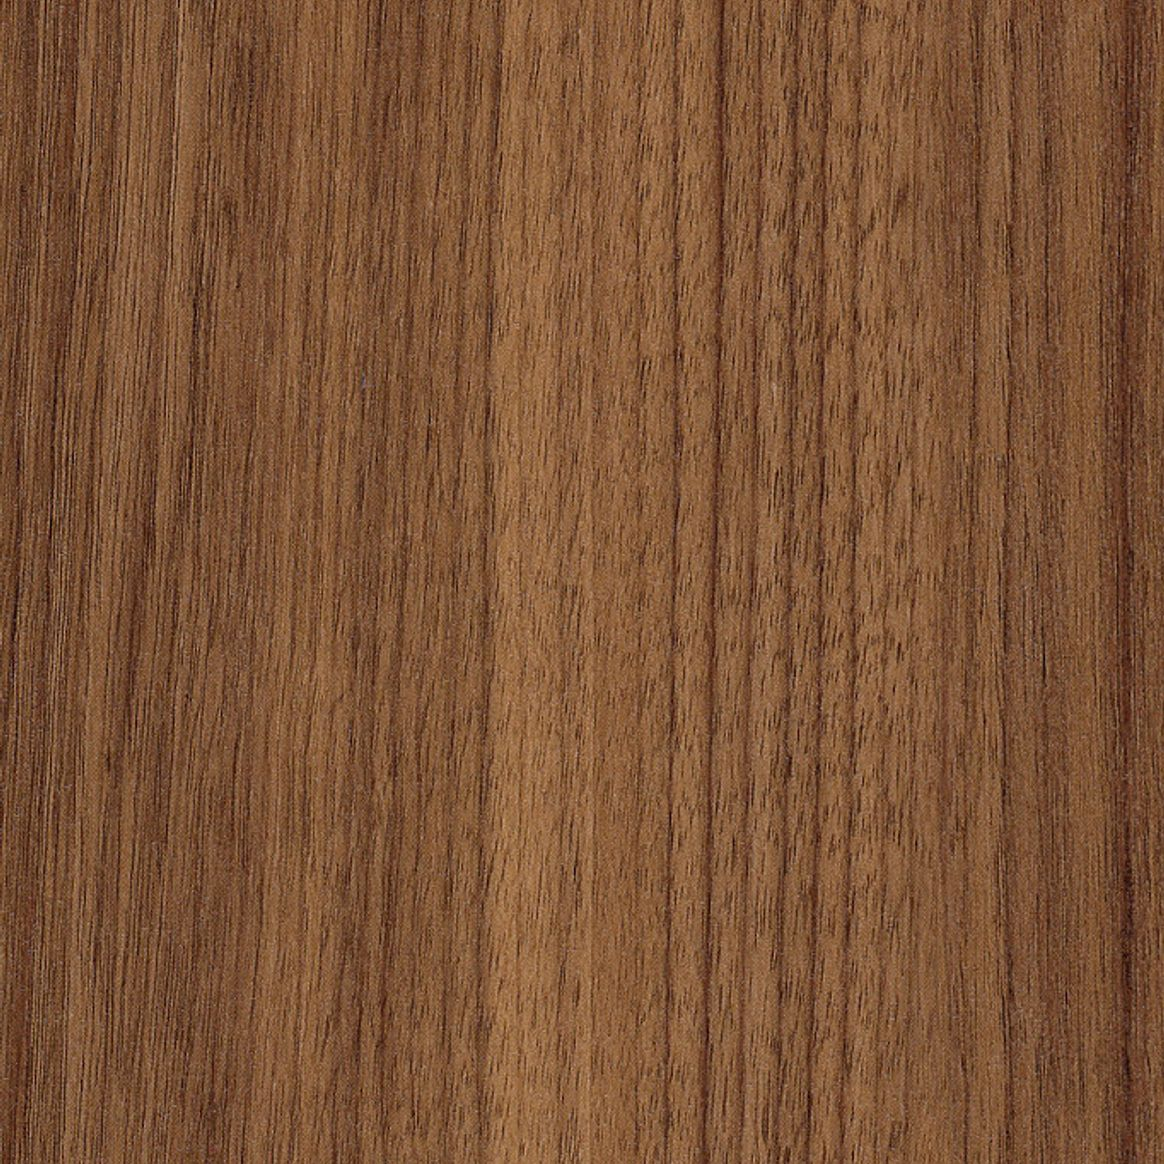 Exotic Walnut tile